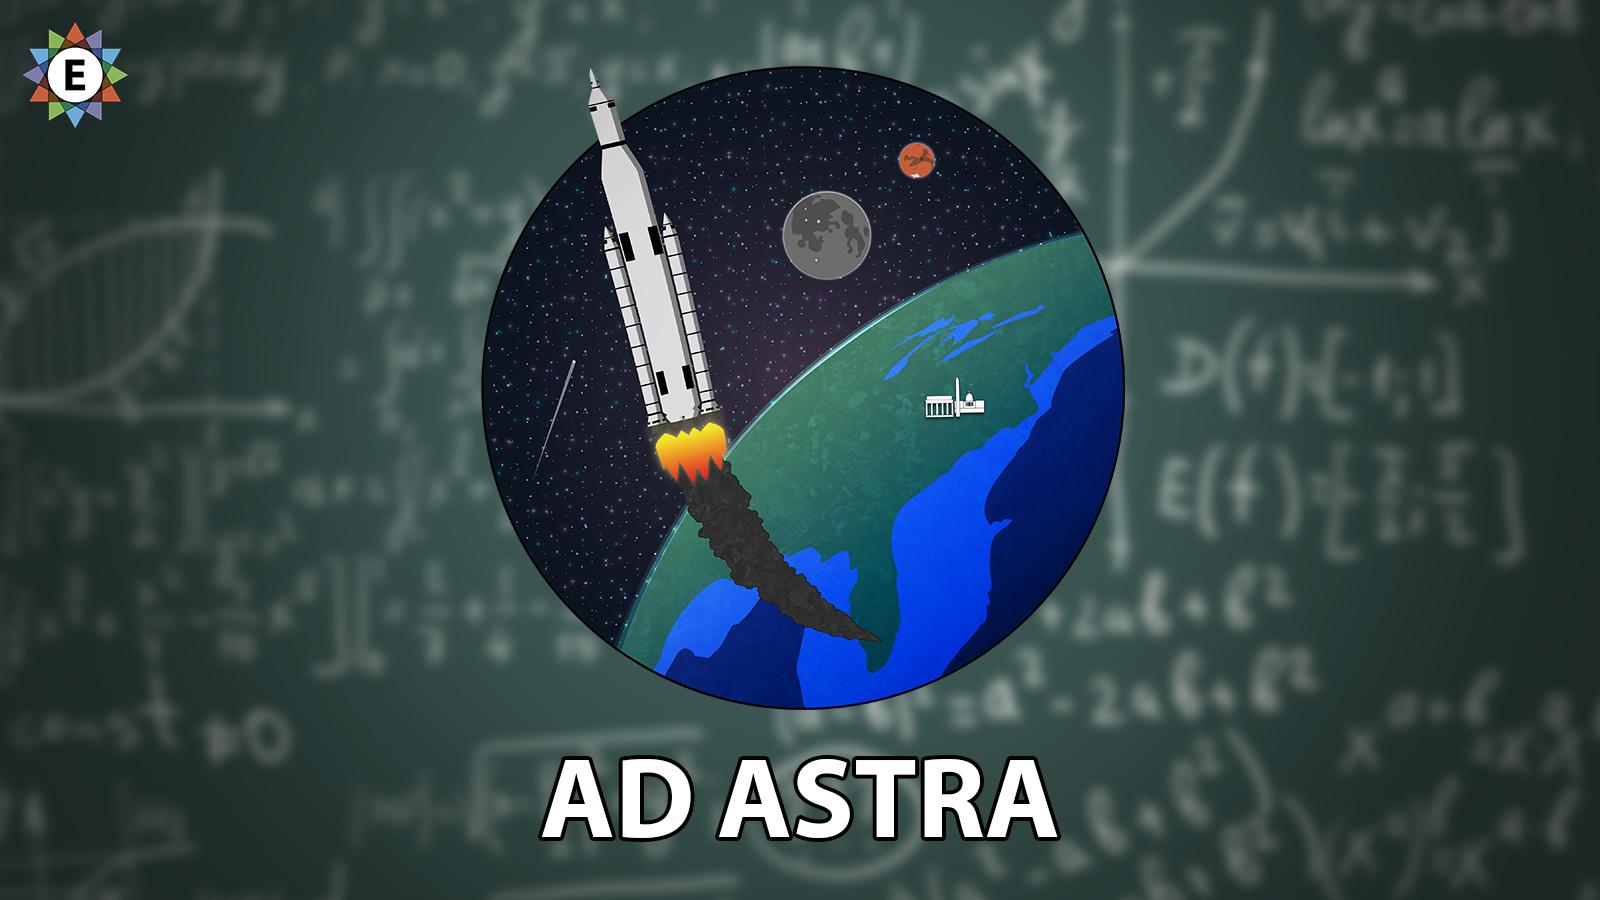 AdAstraWidescreenArt